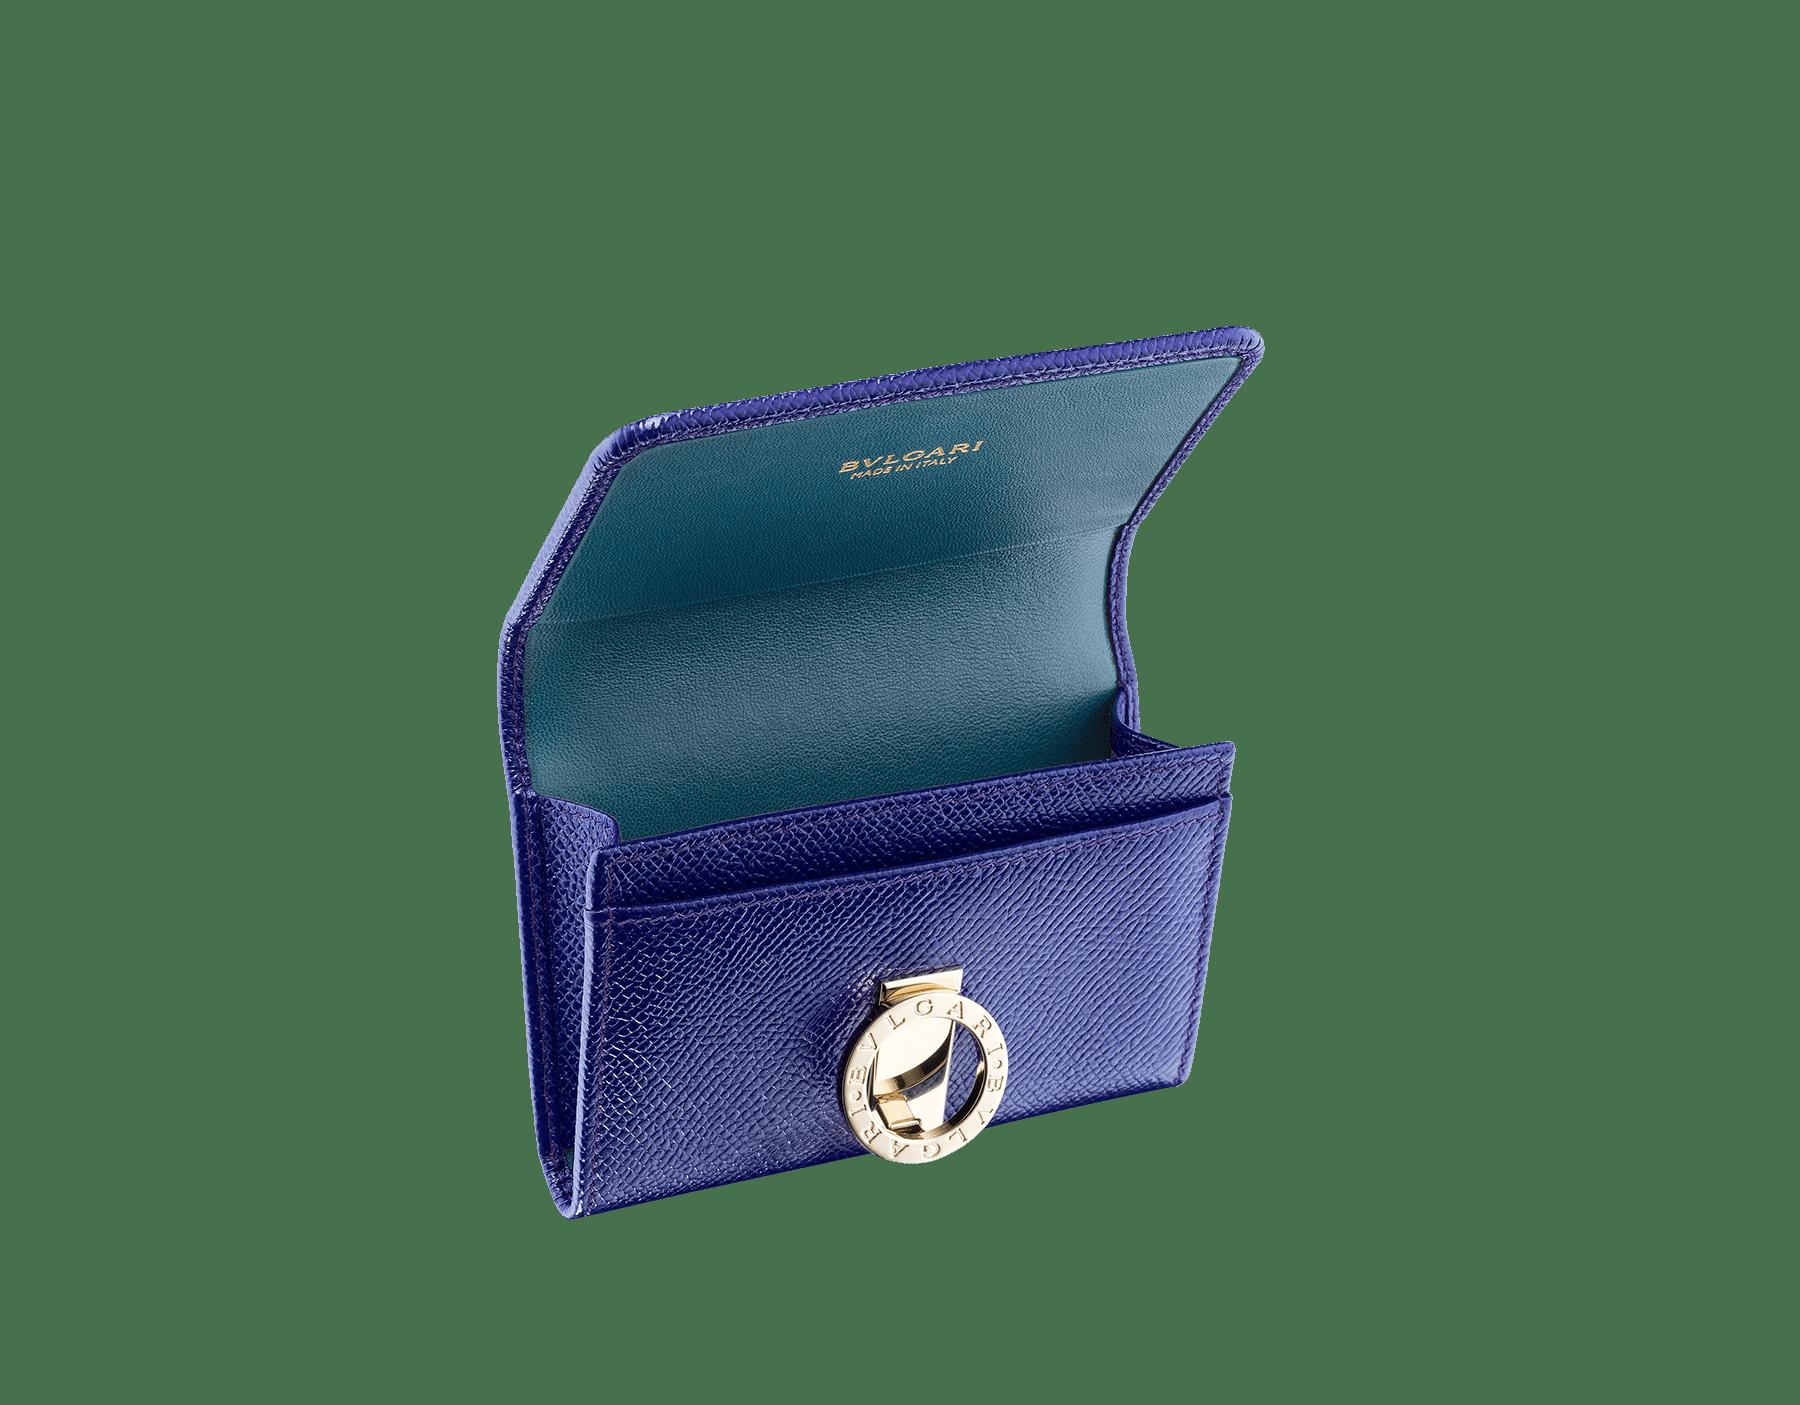 BVLGARI BVLGARI 名片夾,採用薄荷色亮珠面小牛皮和太妃石英色 Nappa 軟面皮。經典淡金色黃銅品牌標誌扣環。 579-BC-HOLDER-BGCLc image 2